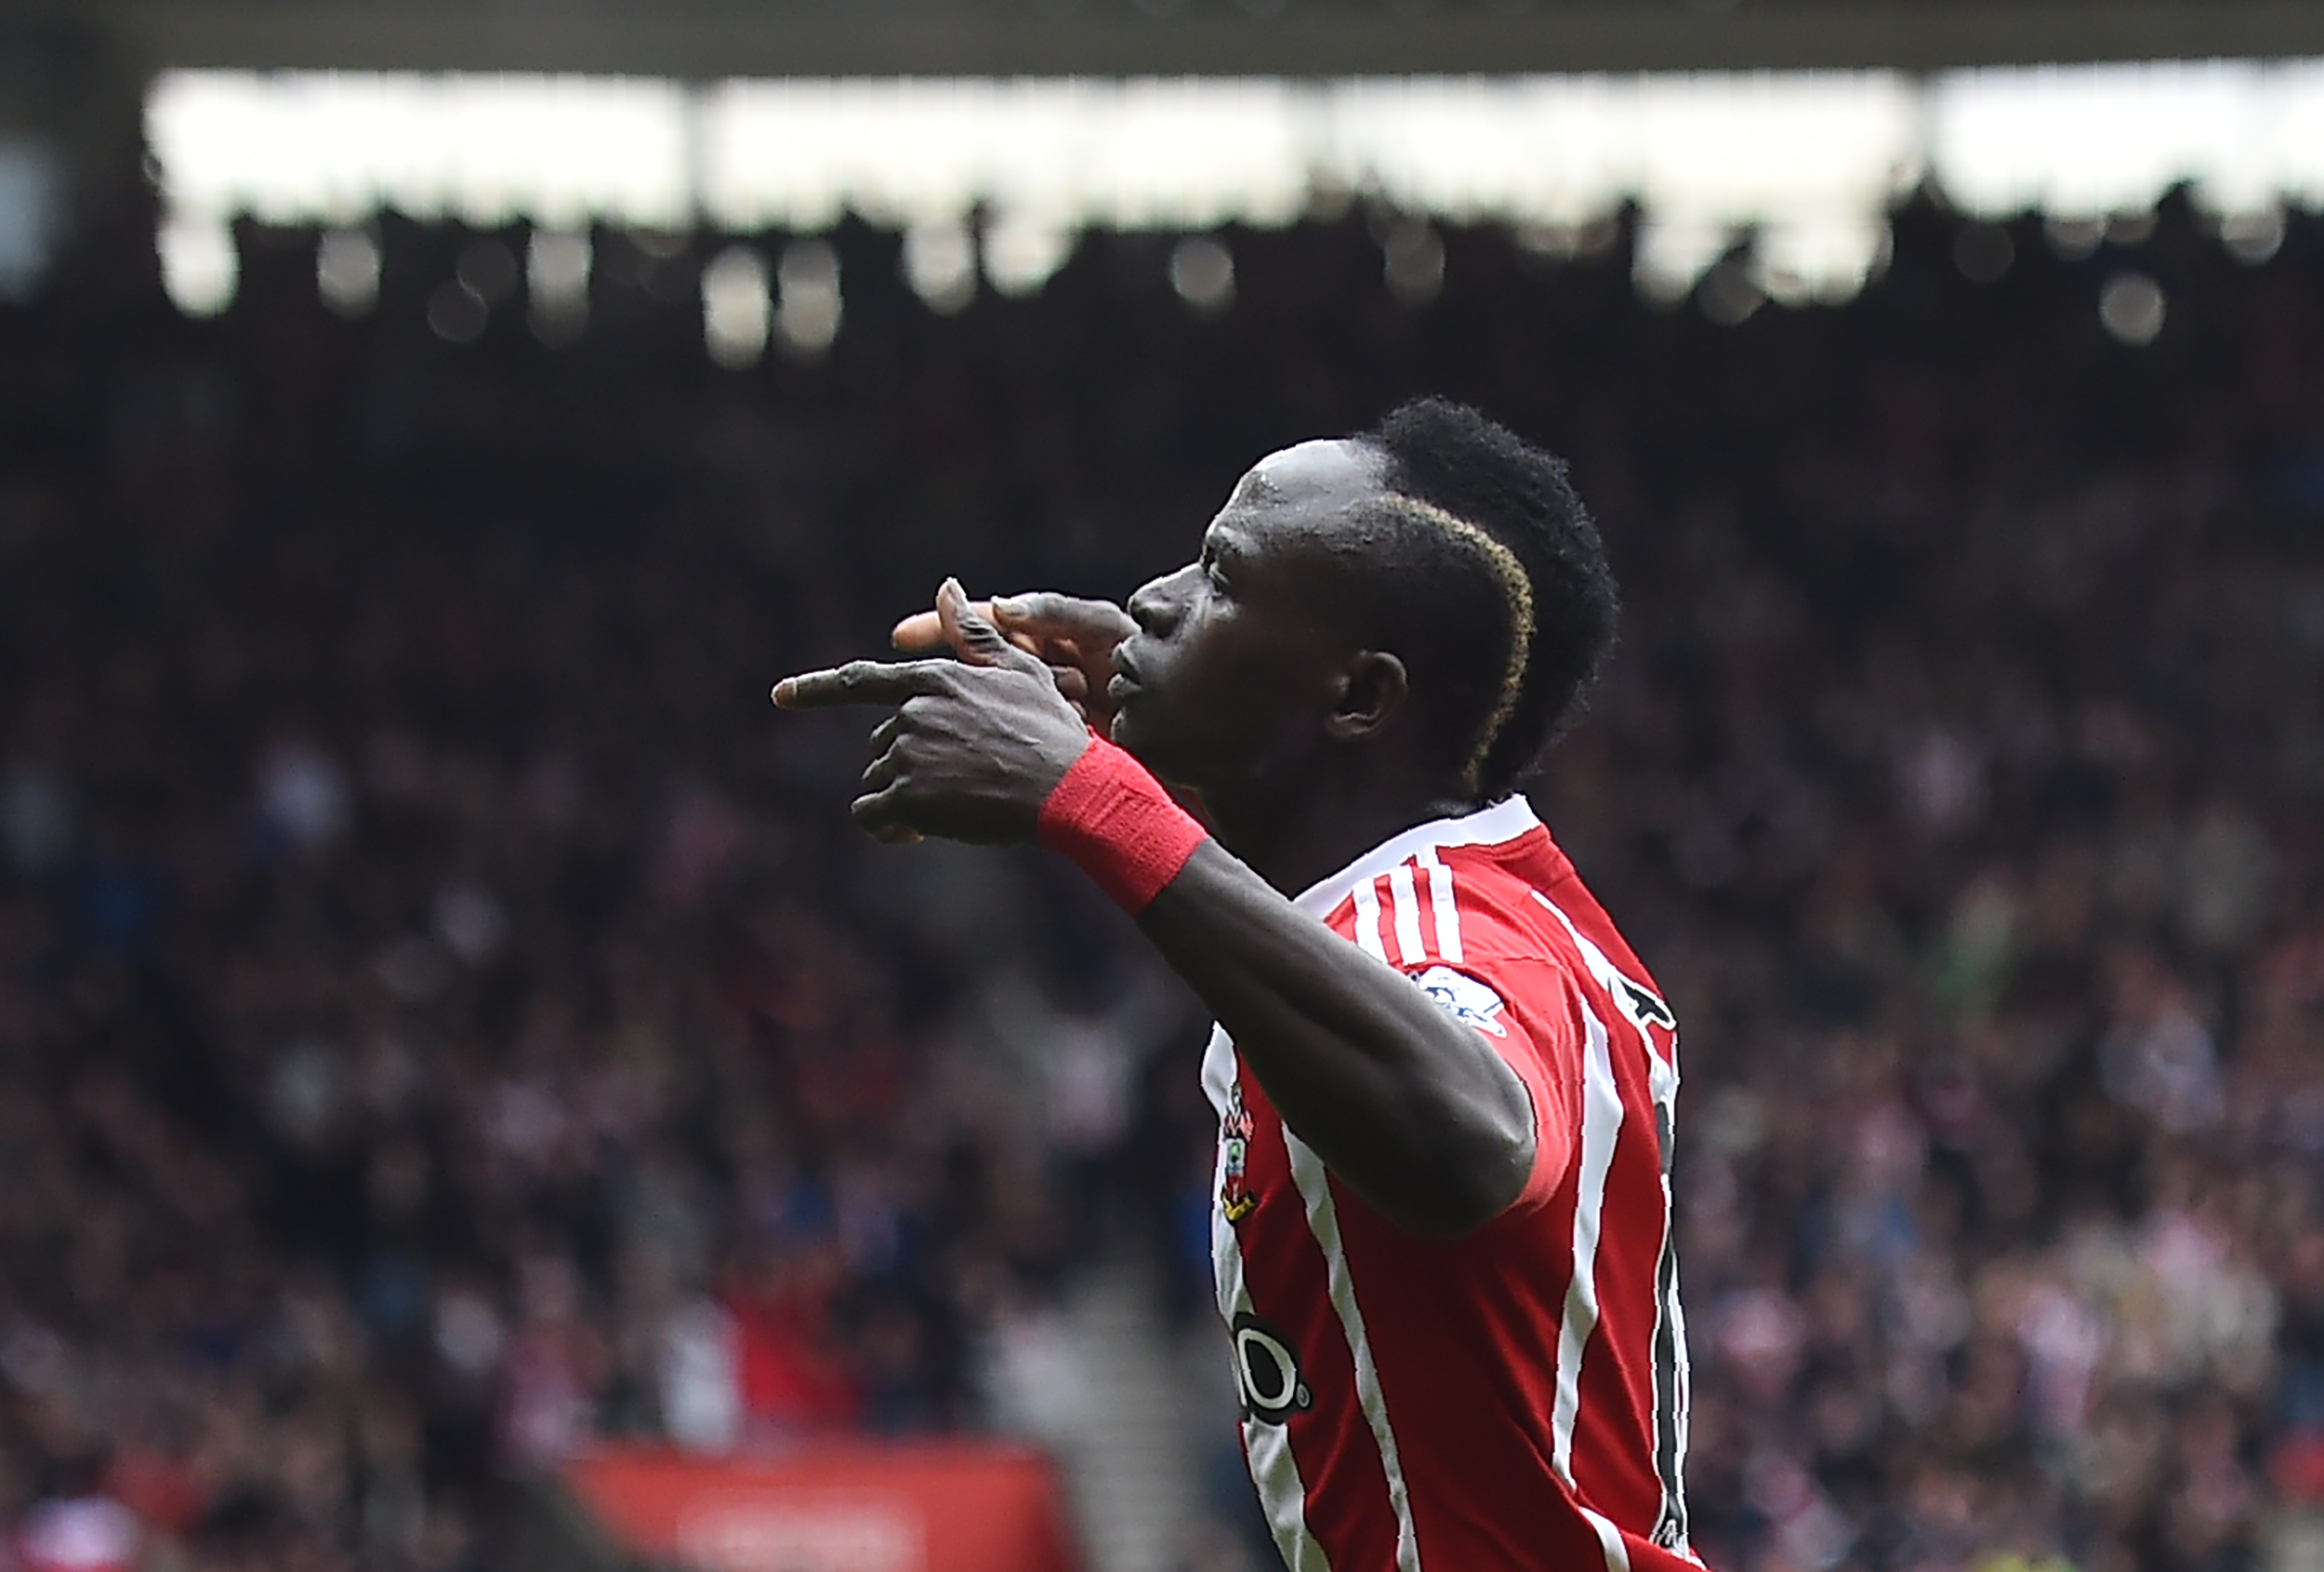 Sadio Mane is going to love life at Liverpool, says Mamadou Sakho